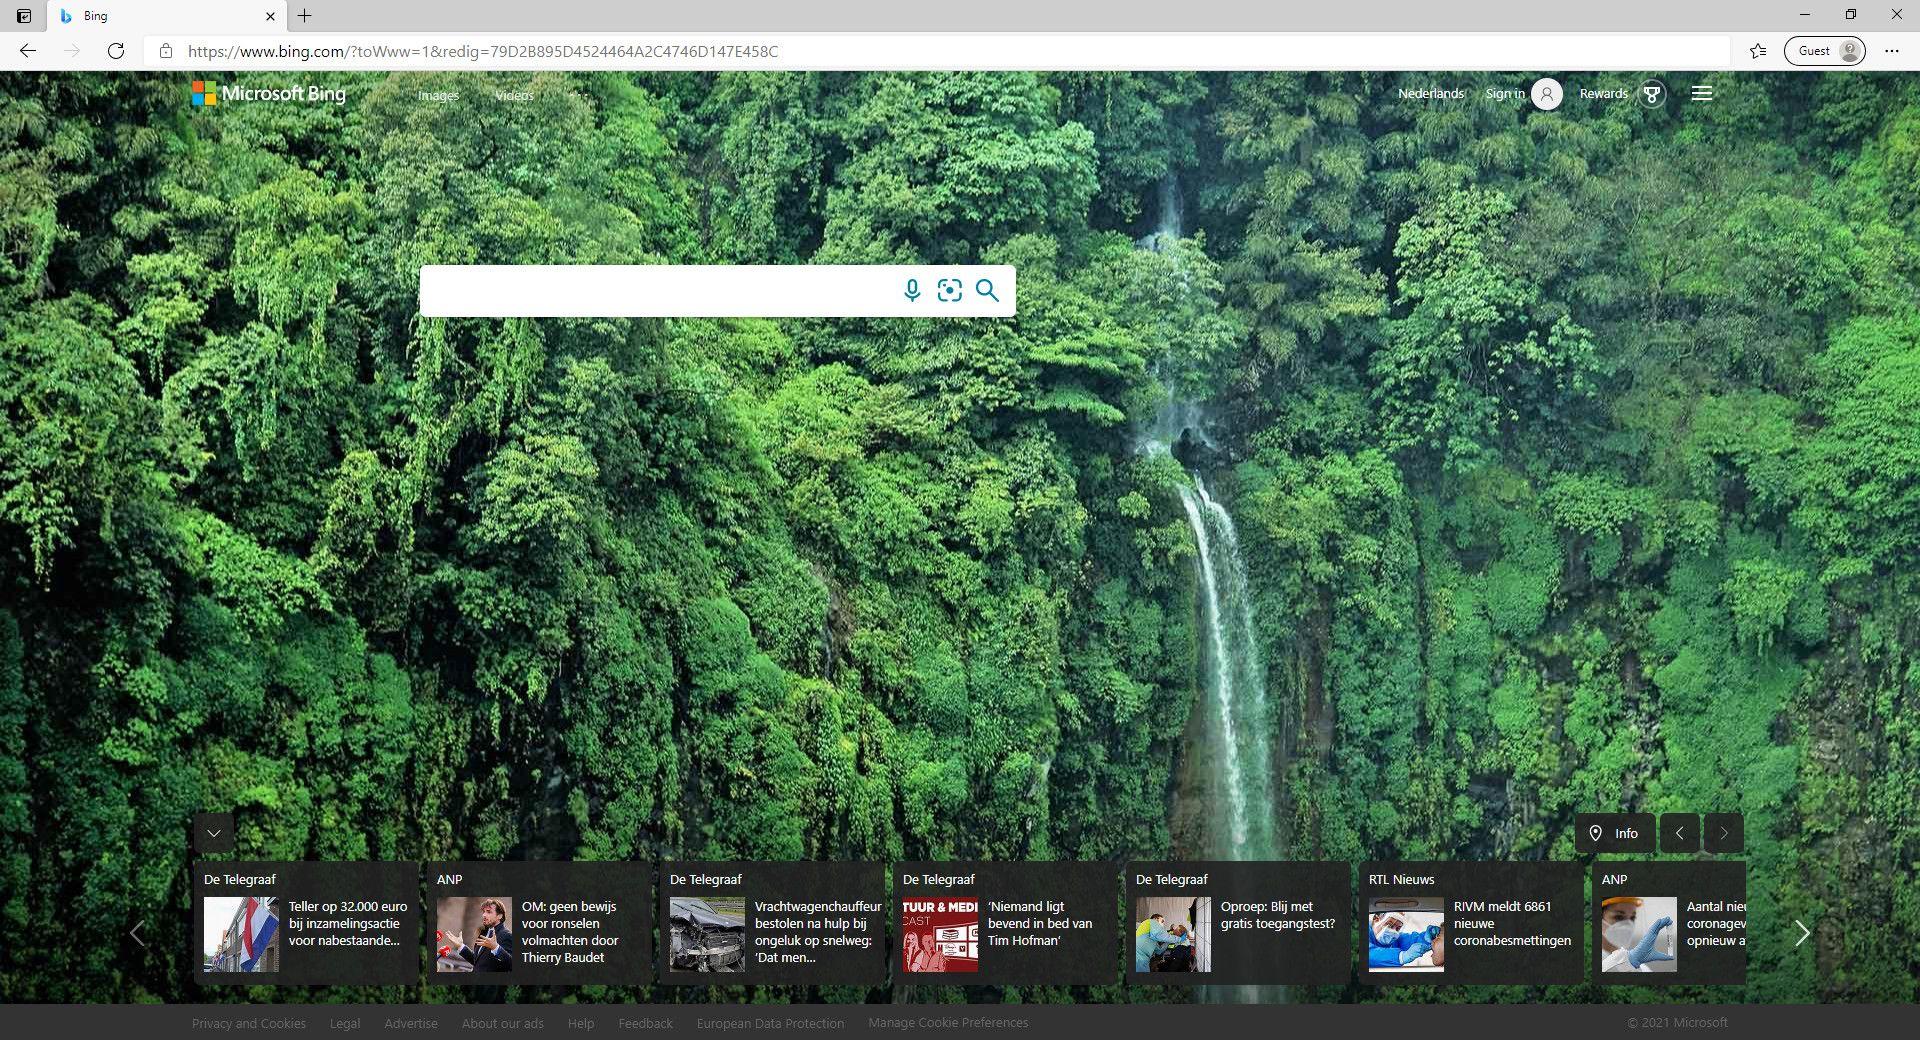 Screenshot taken on Microsoft Edge / Windows 10